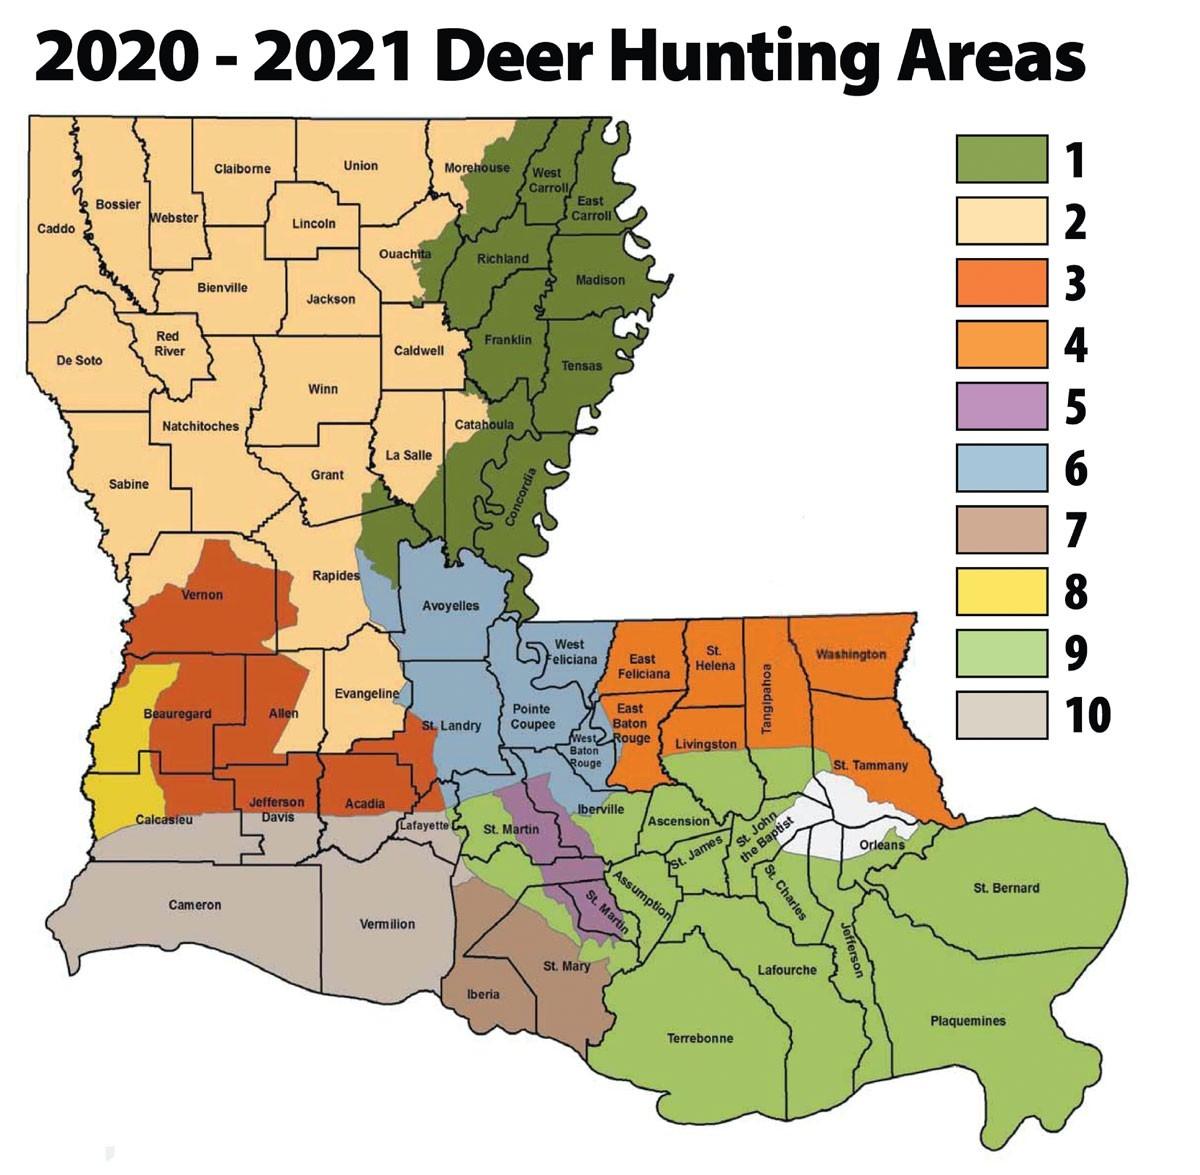 Louisiana'S 2020 Rut Report - Louisiana Sportsman-Peak Rut Predictions For 2021